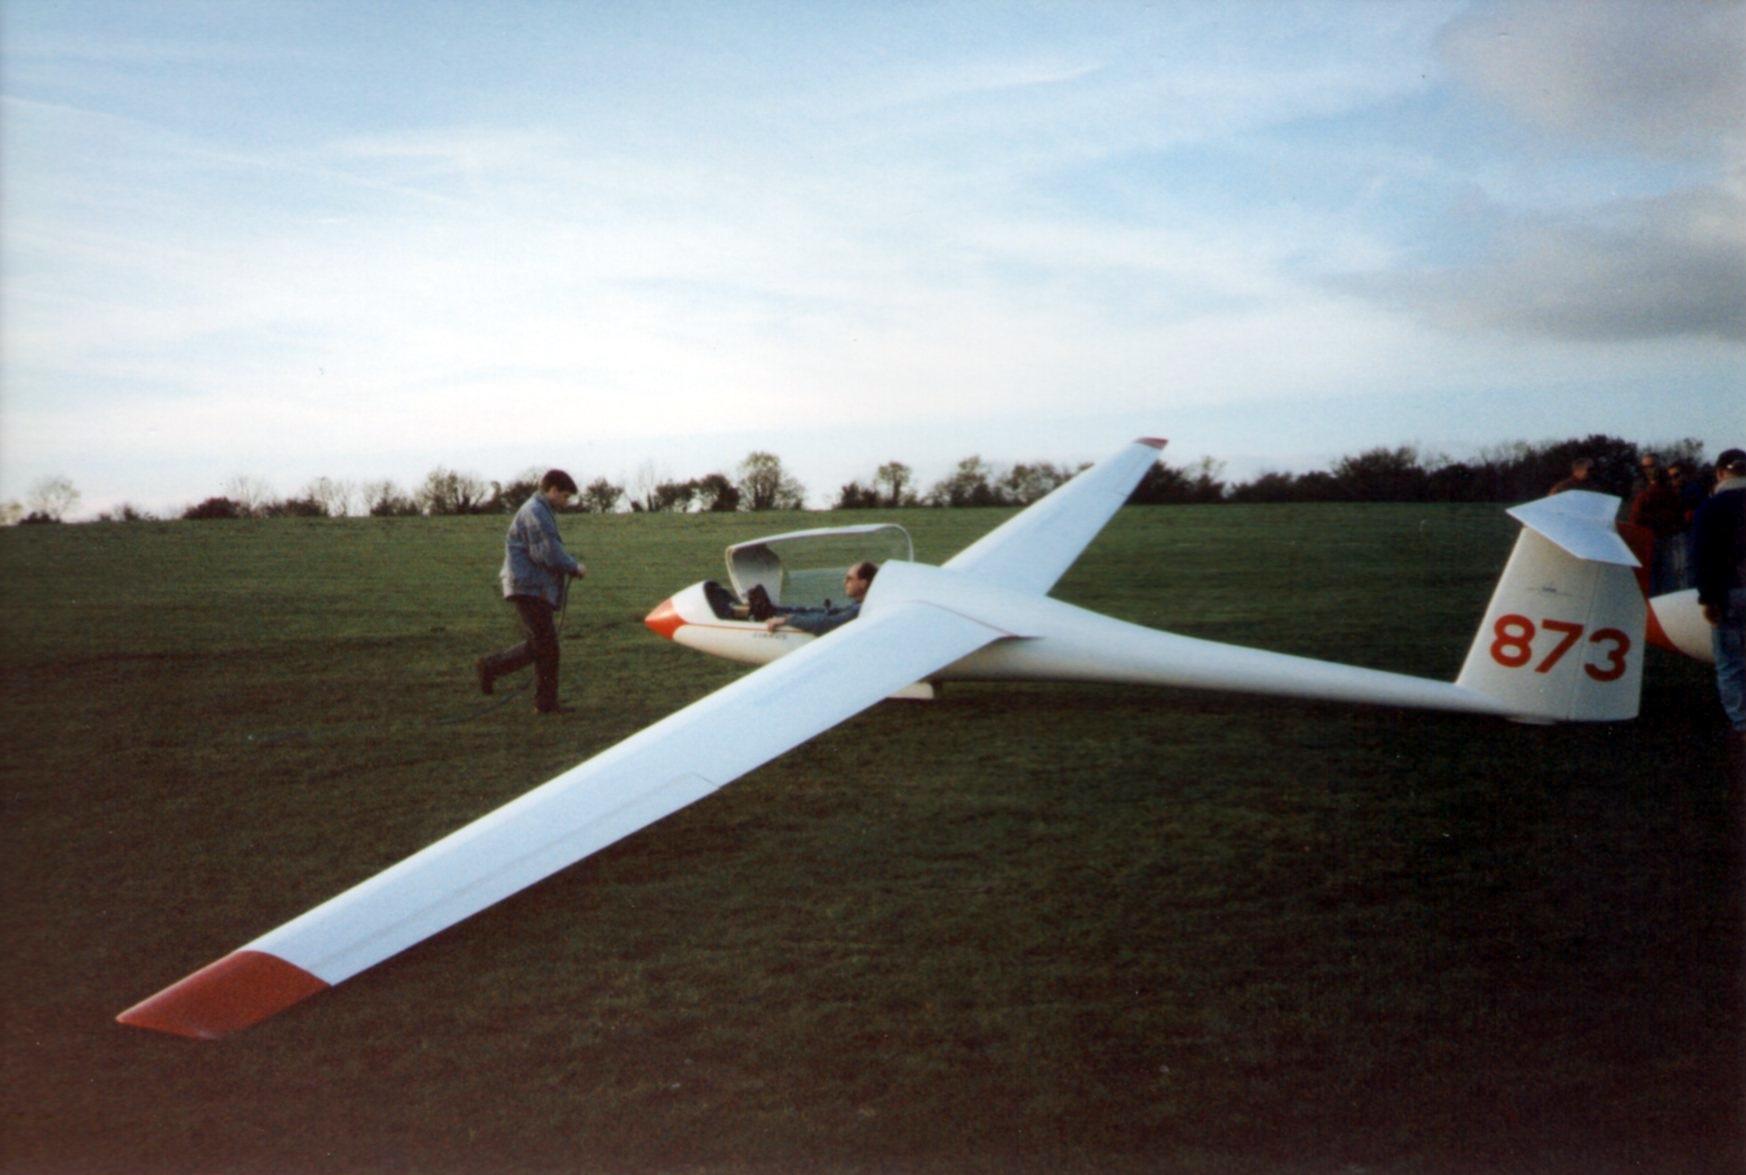 Gliding - Standard Cirrus 873